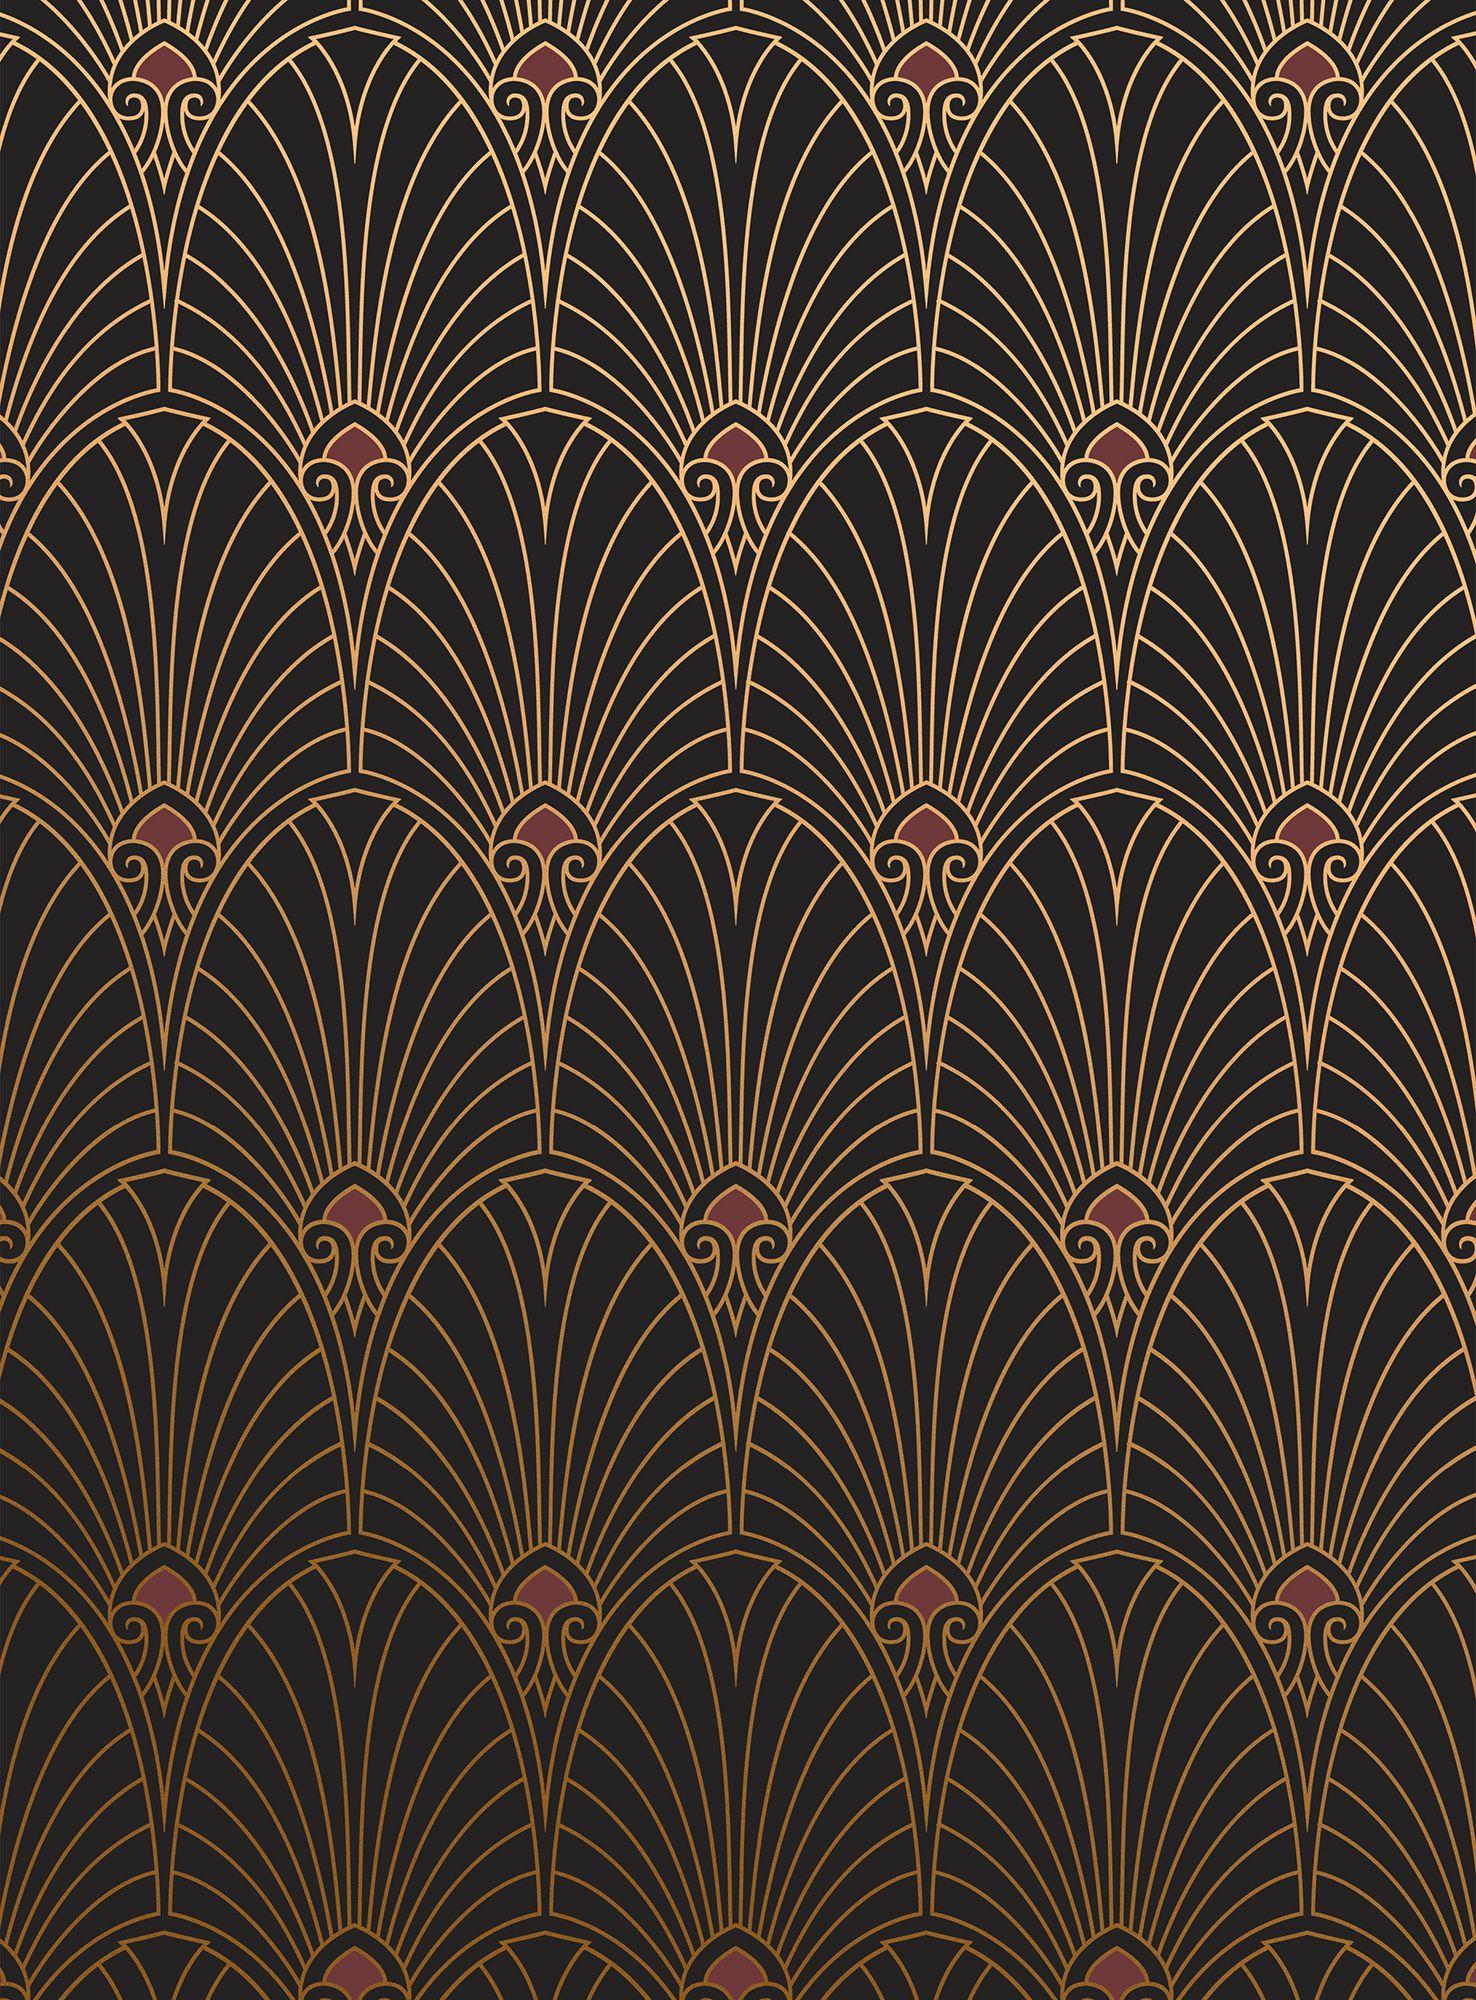 incredible Art Deco Geometric Wallpaper Part - 8: Art Deco wallpaper